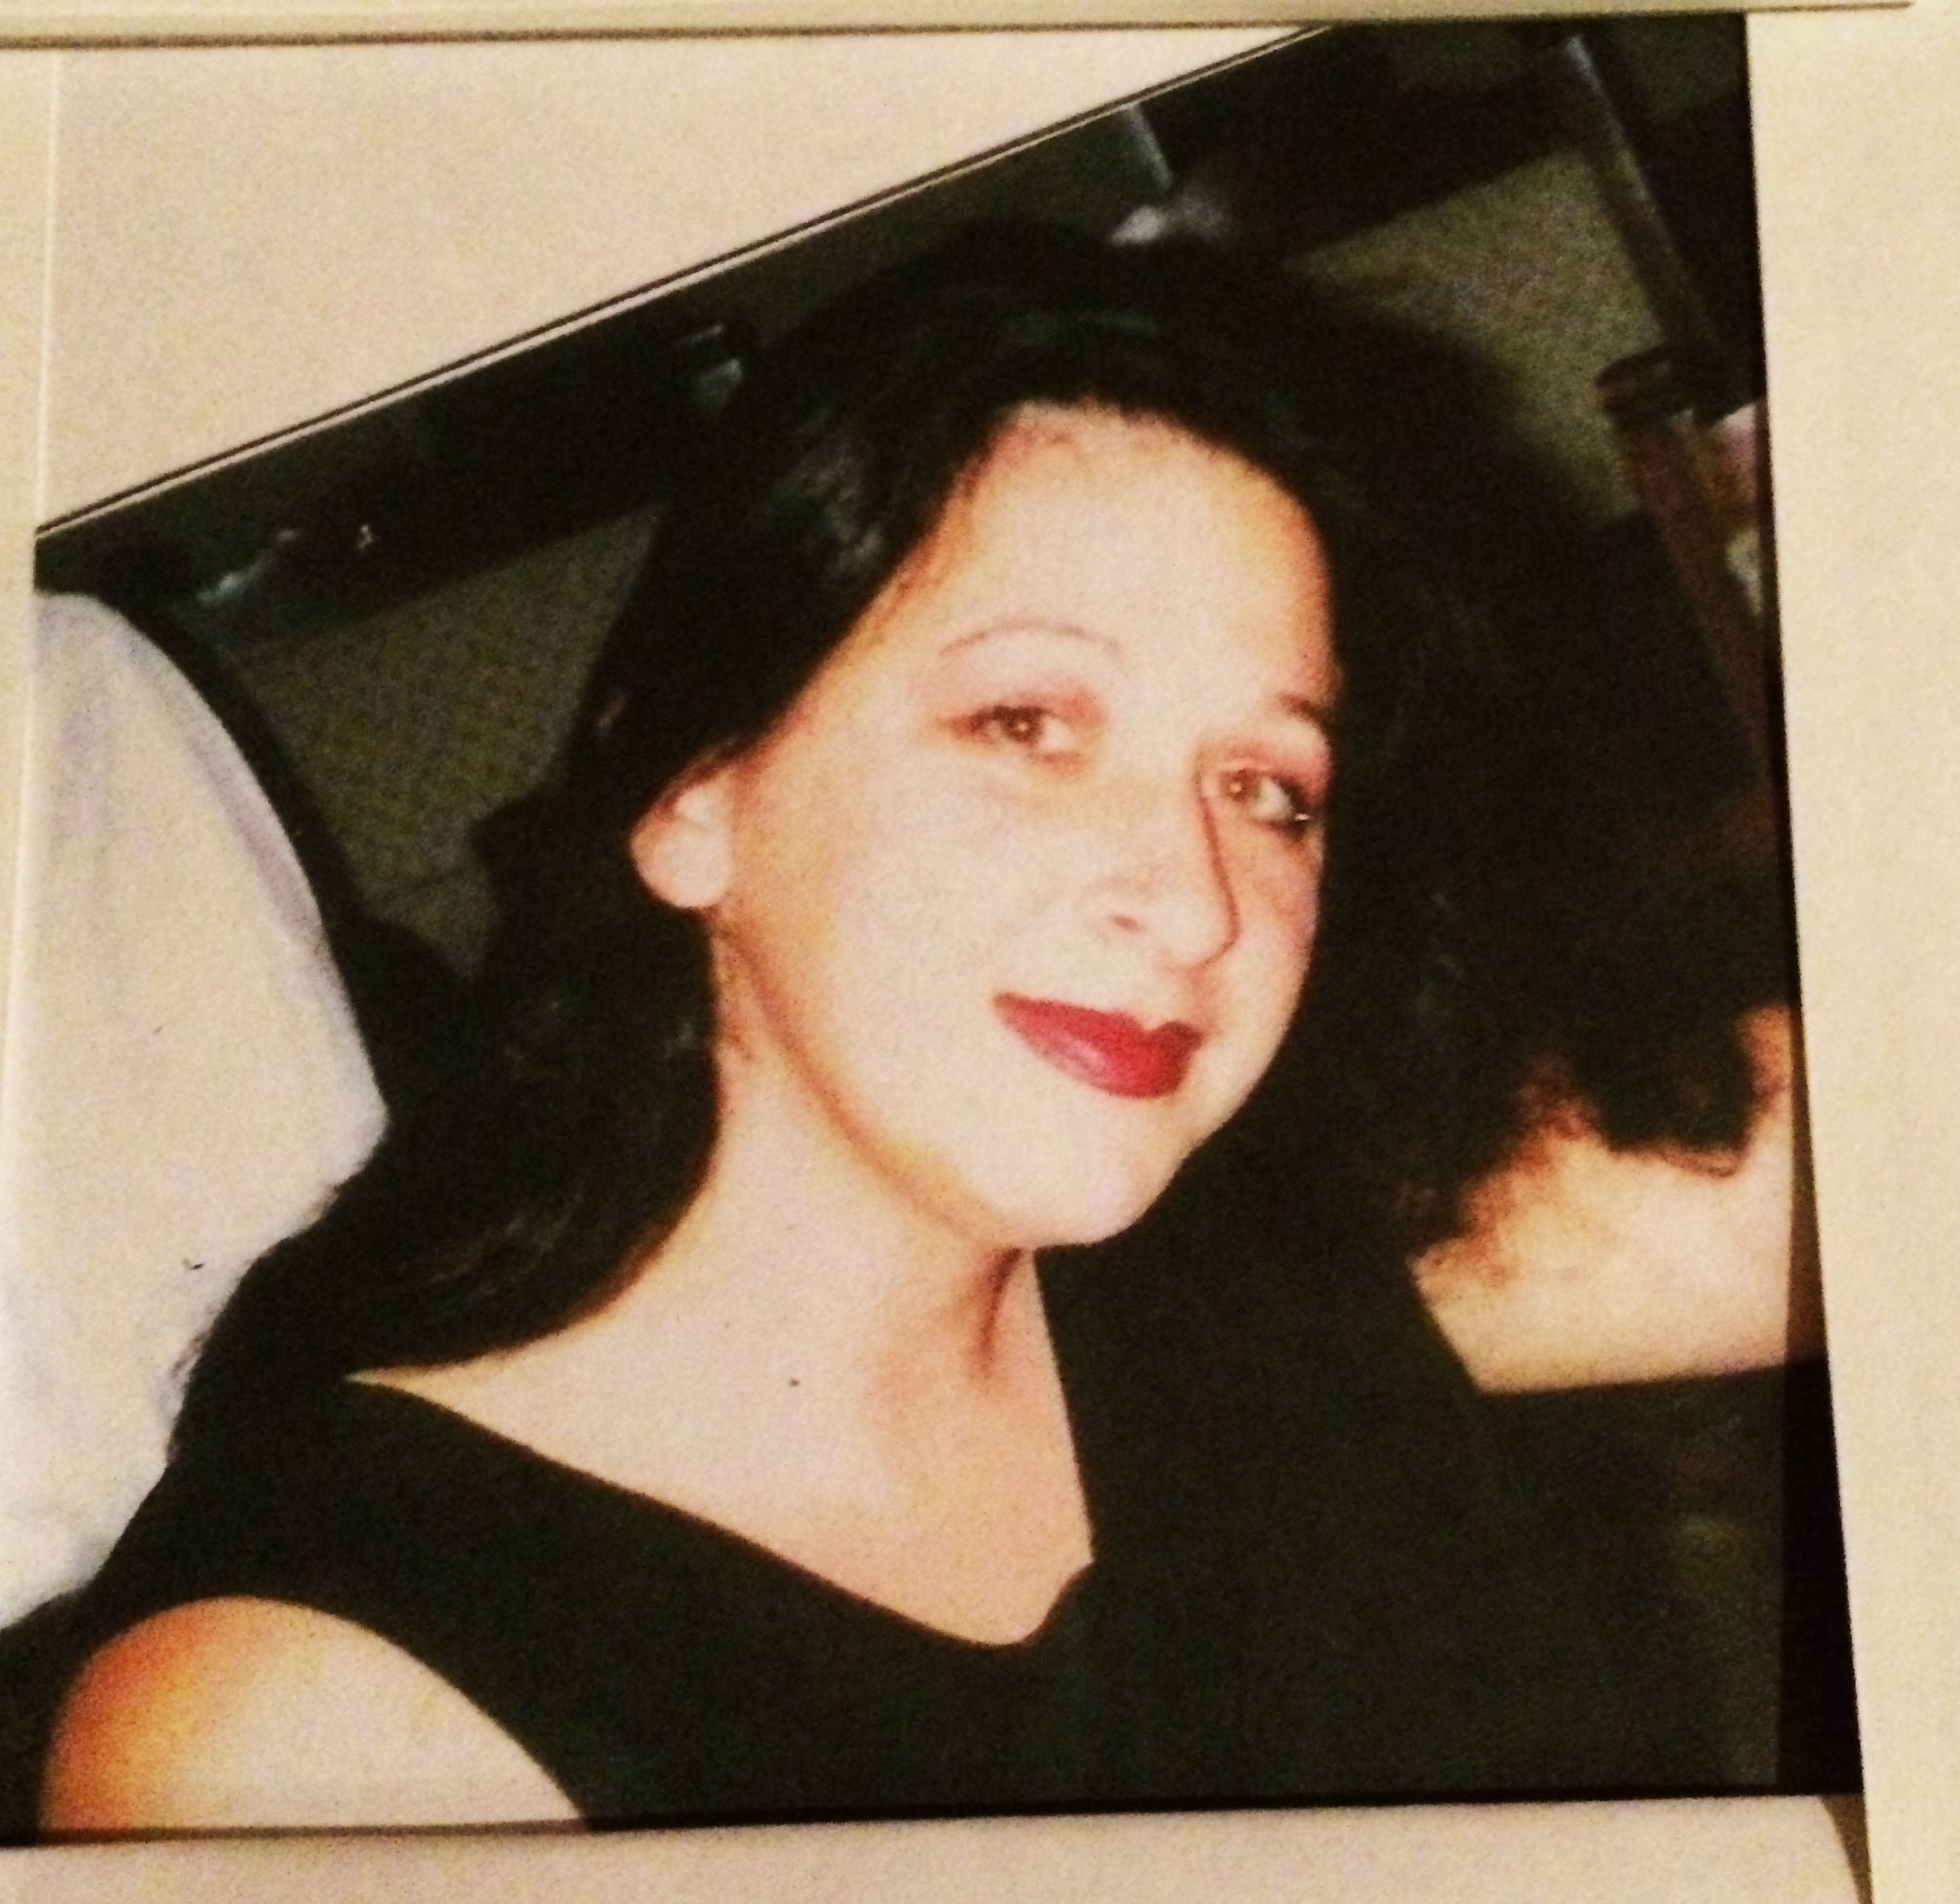 Luis' daughter, Liza